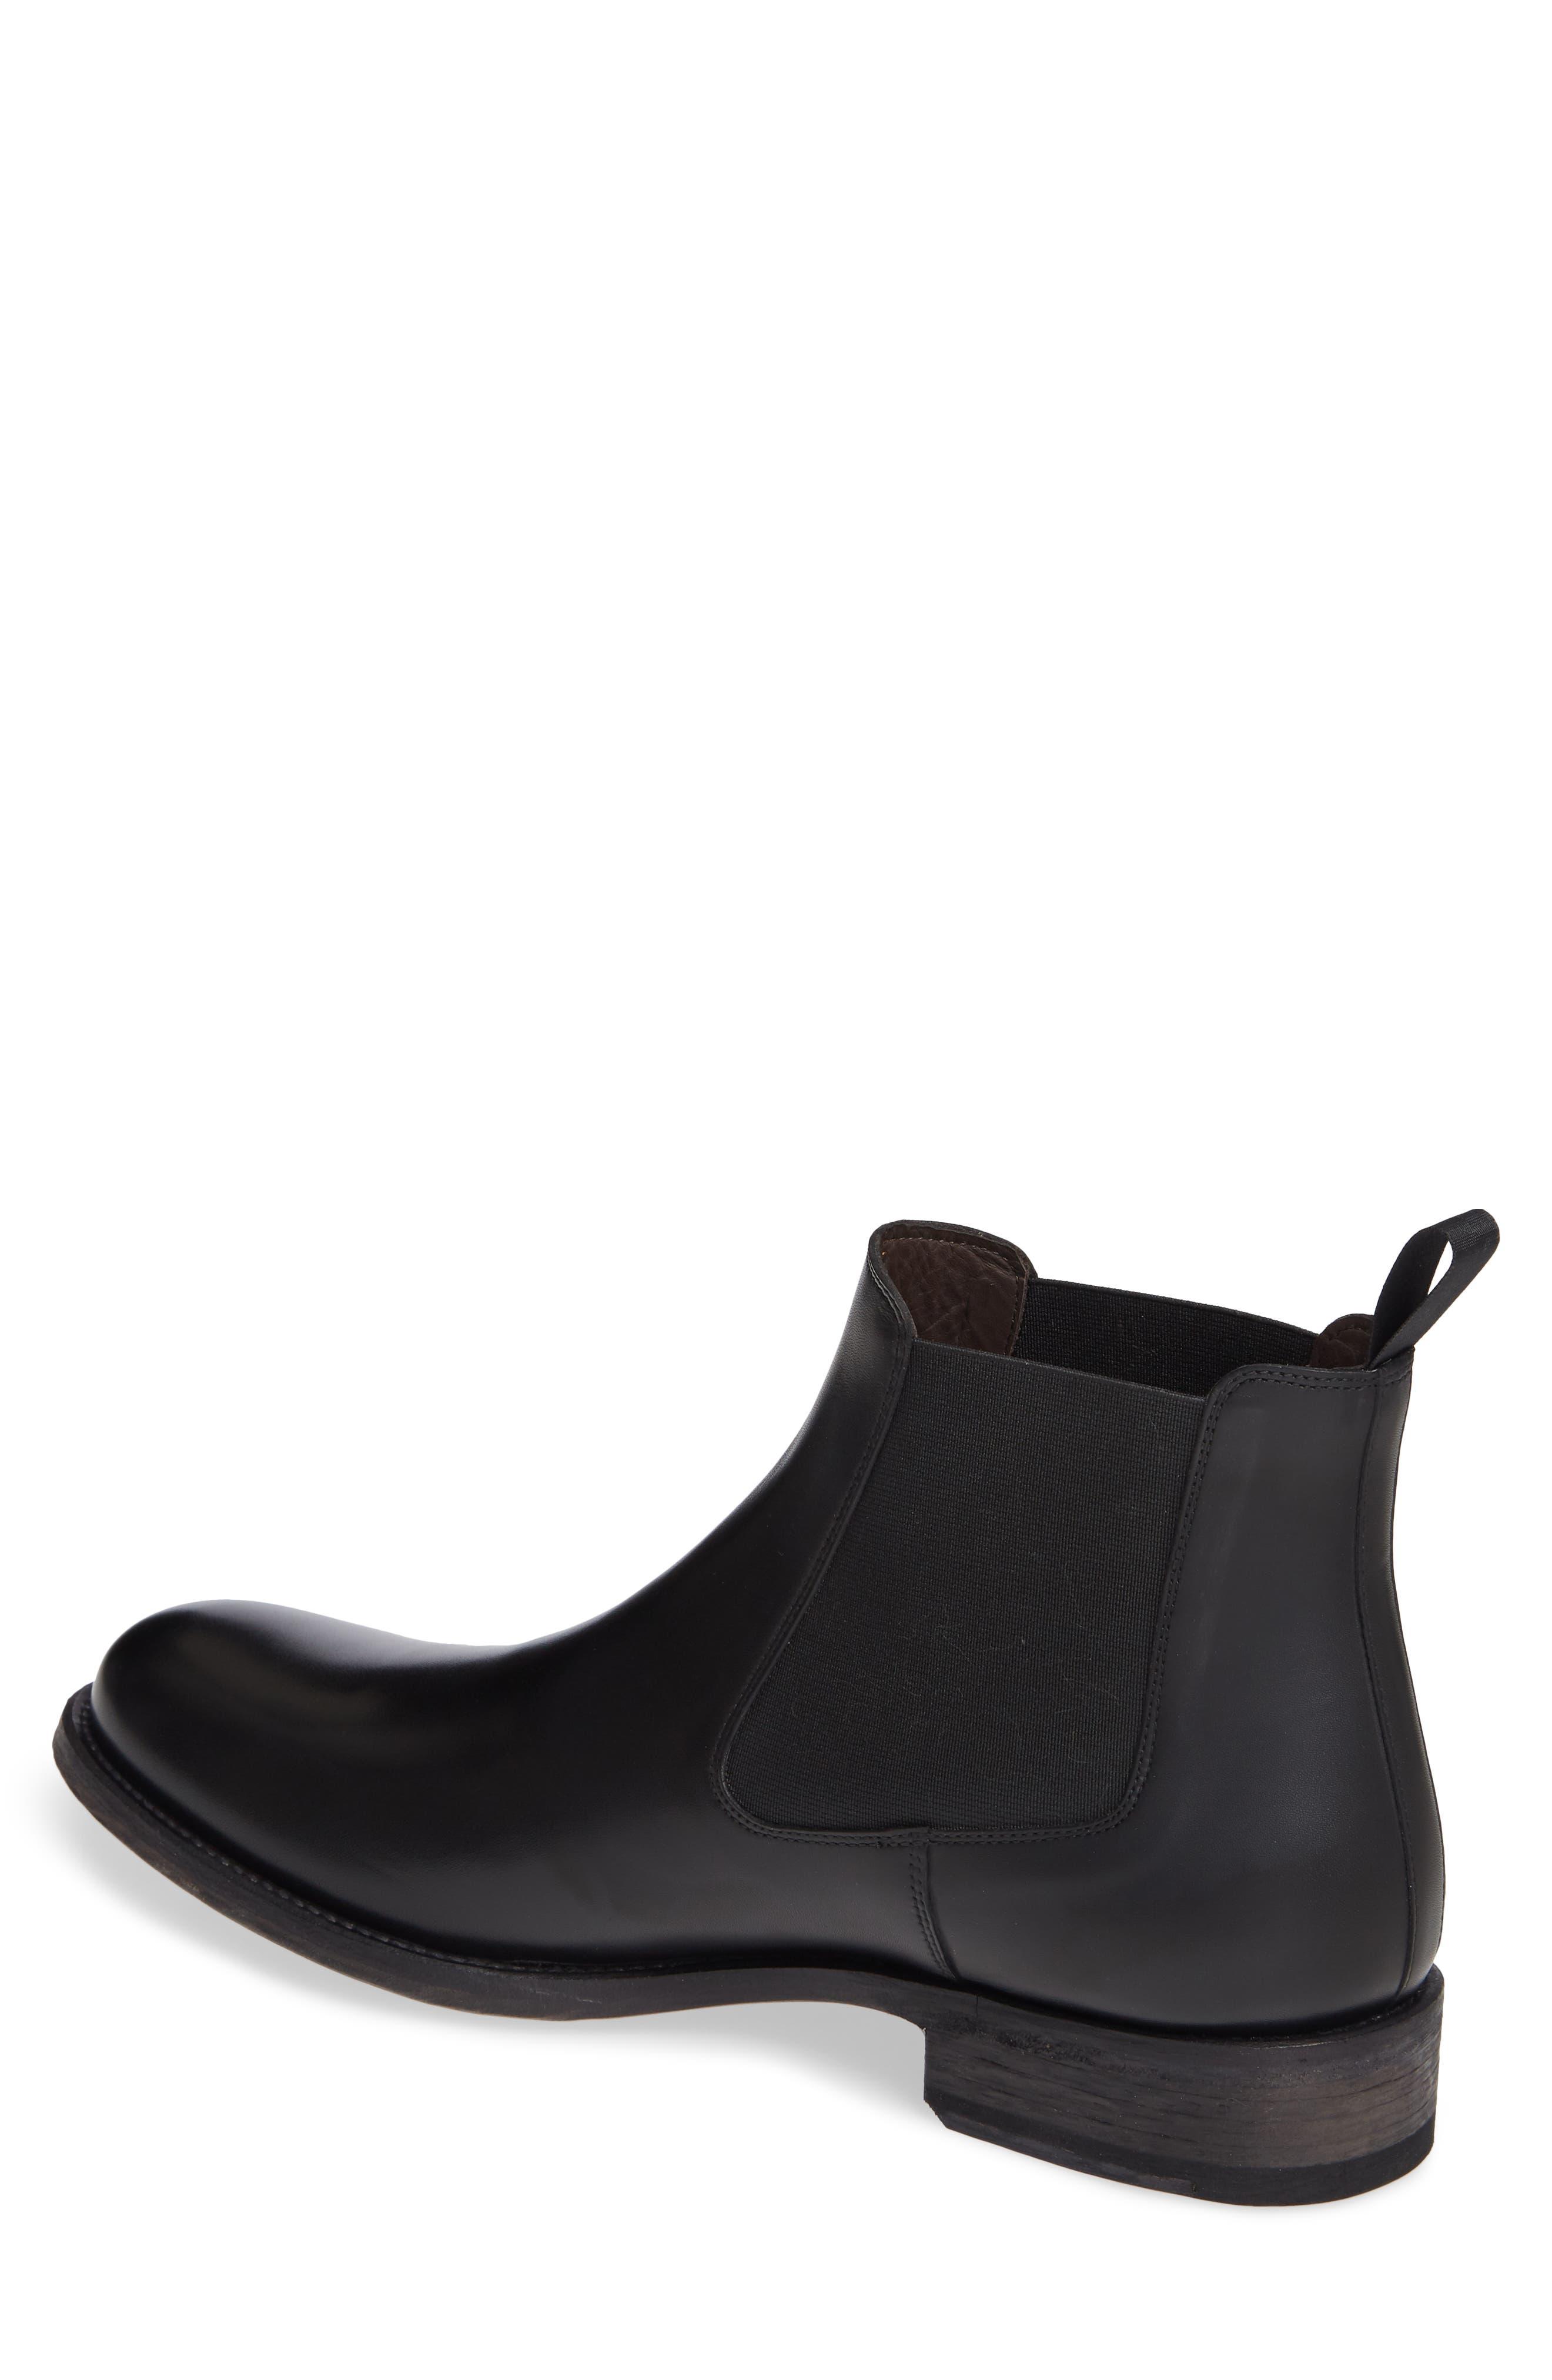 Saburo Water Resistant Chelsea Boot,                             Alternate thumbnail 2, color,                             BLACK LEATHER